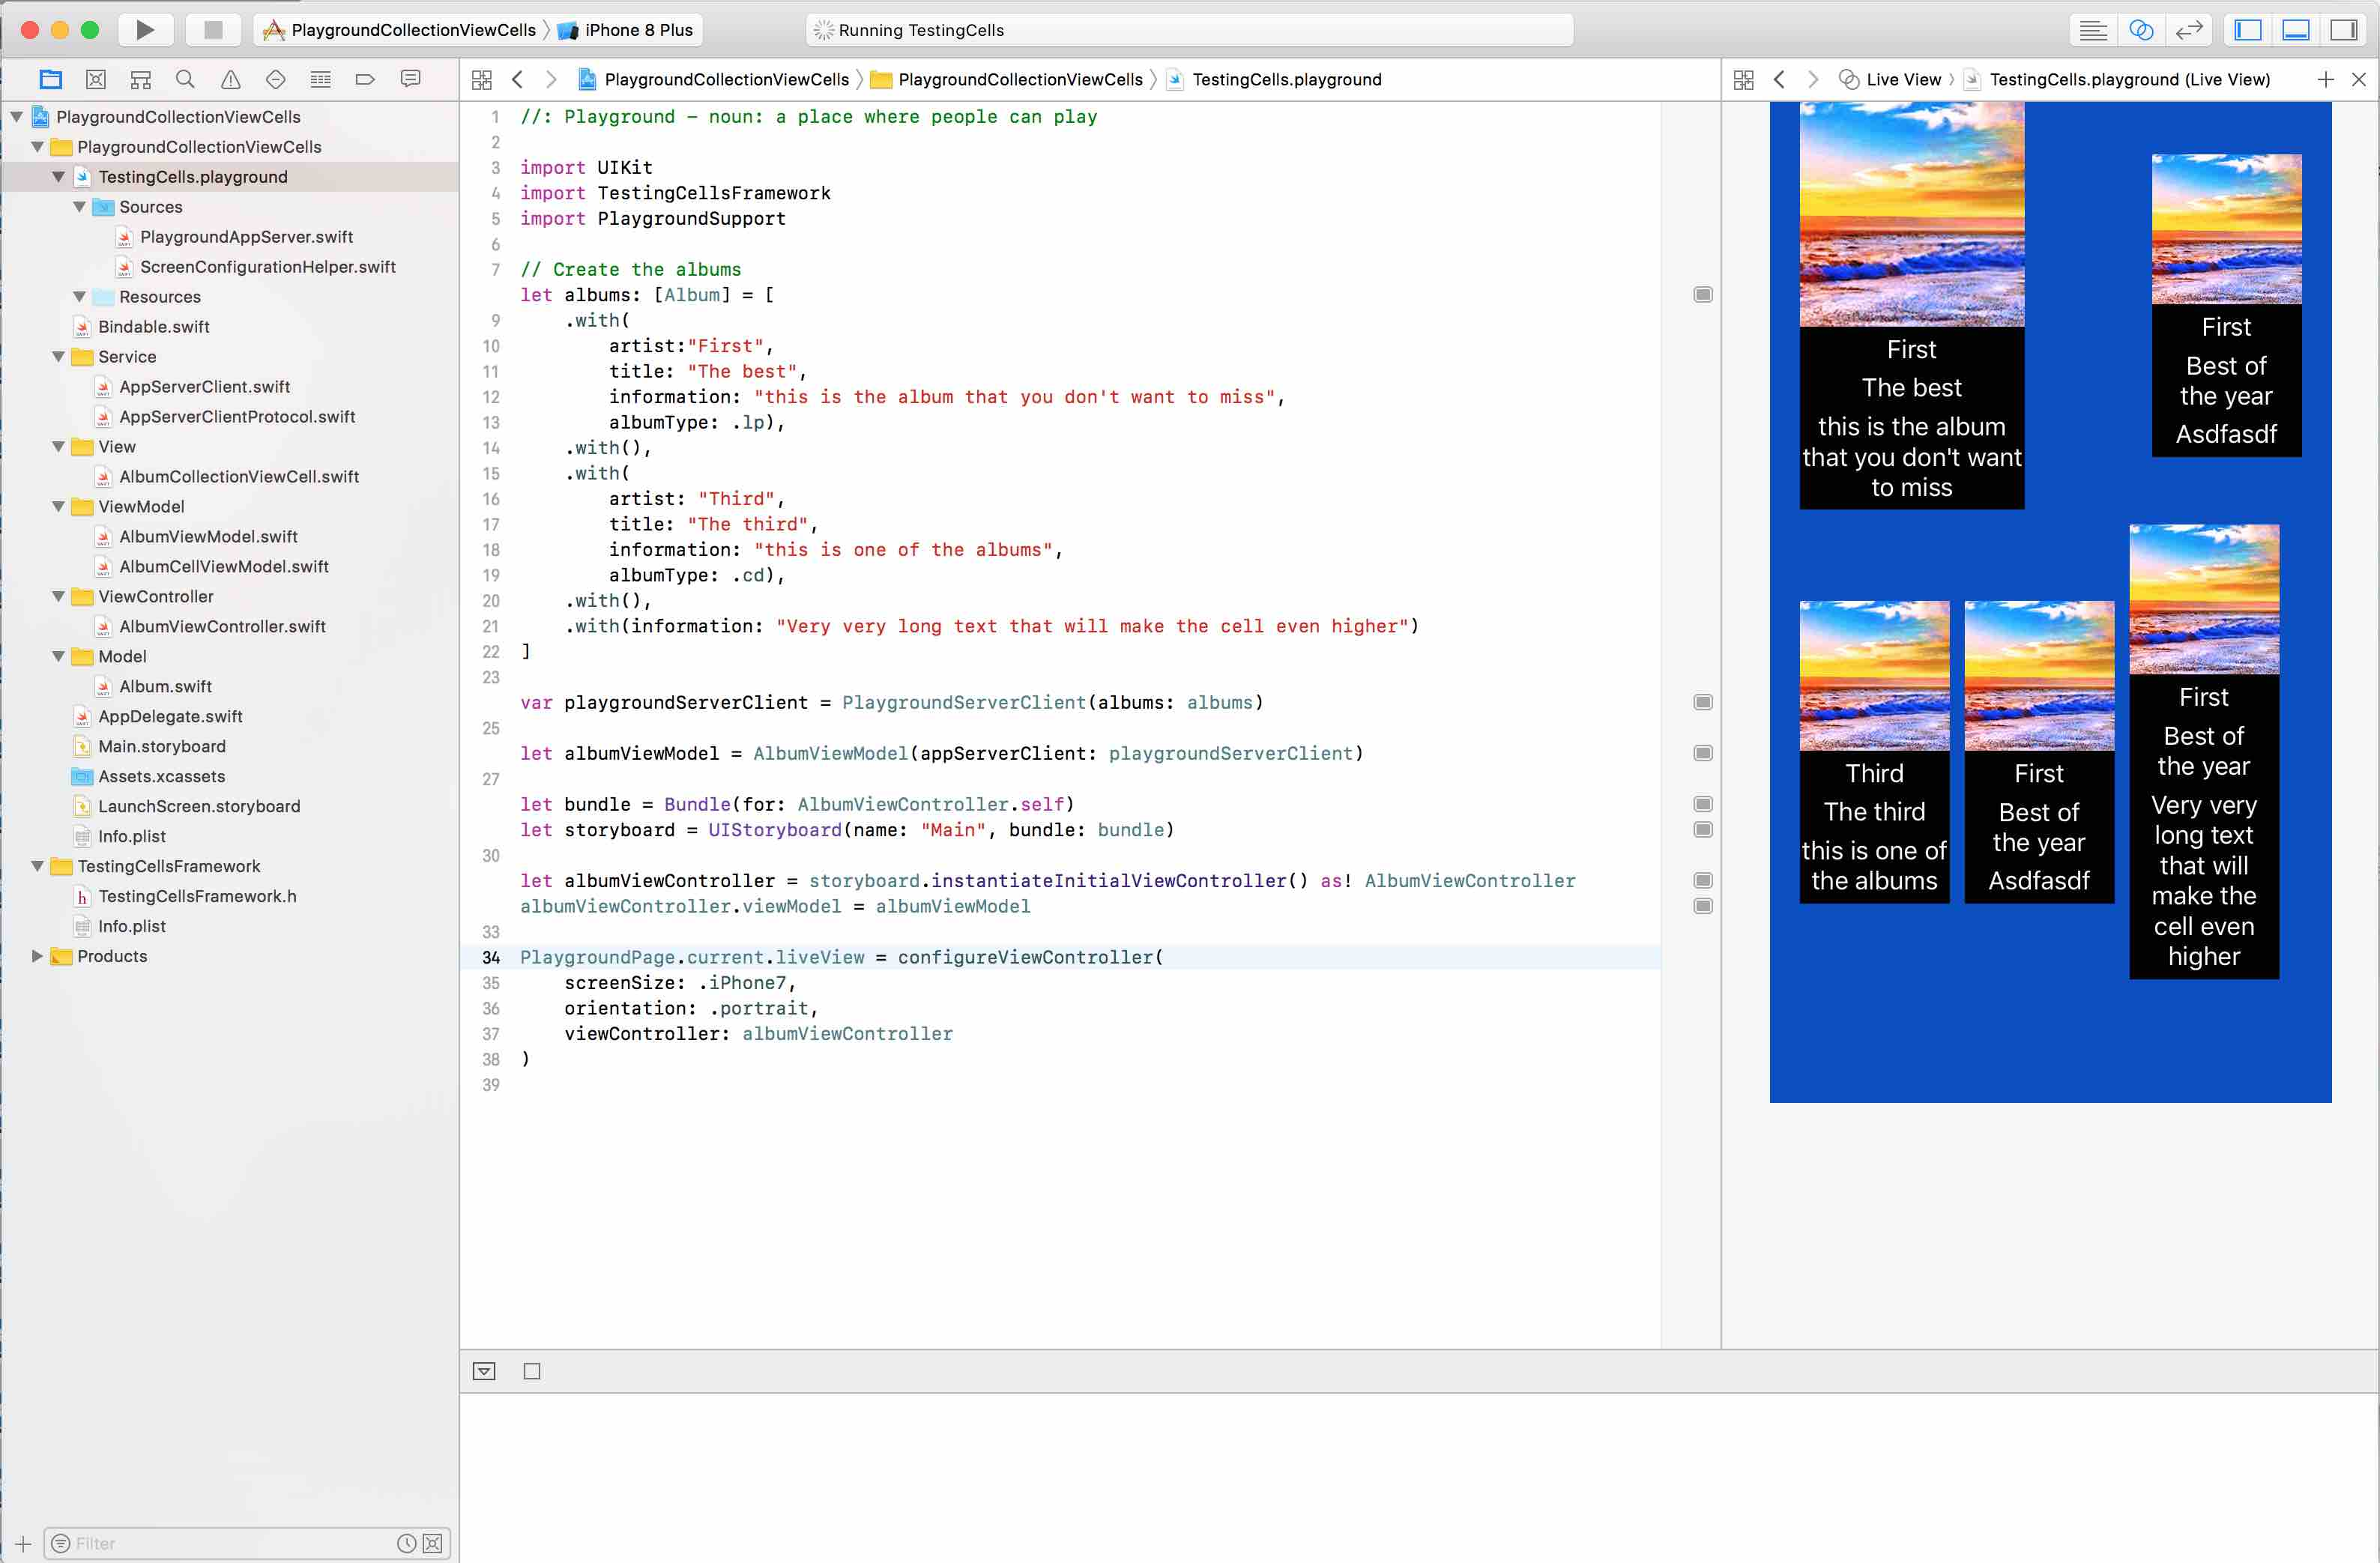 How to use Swift playgrounds to help with UI development - SwiftyJimmy